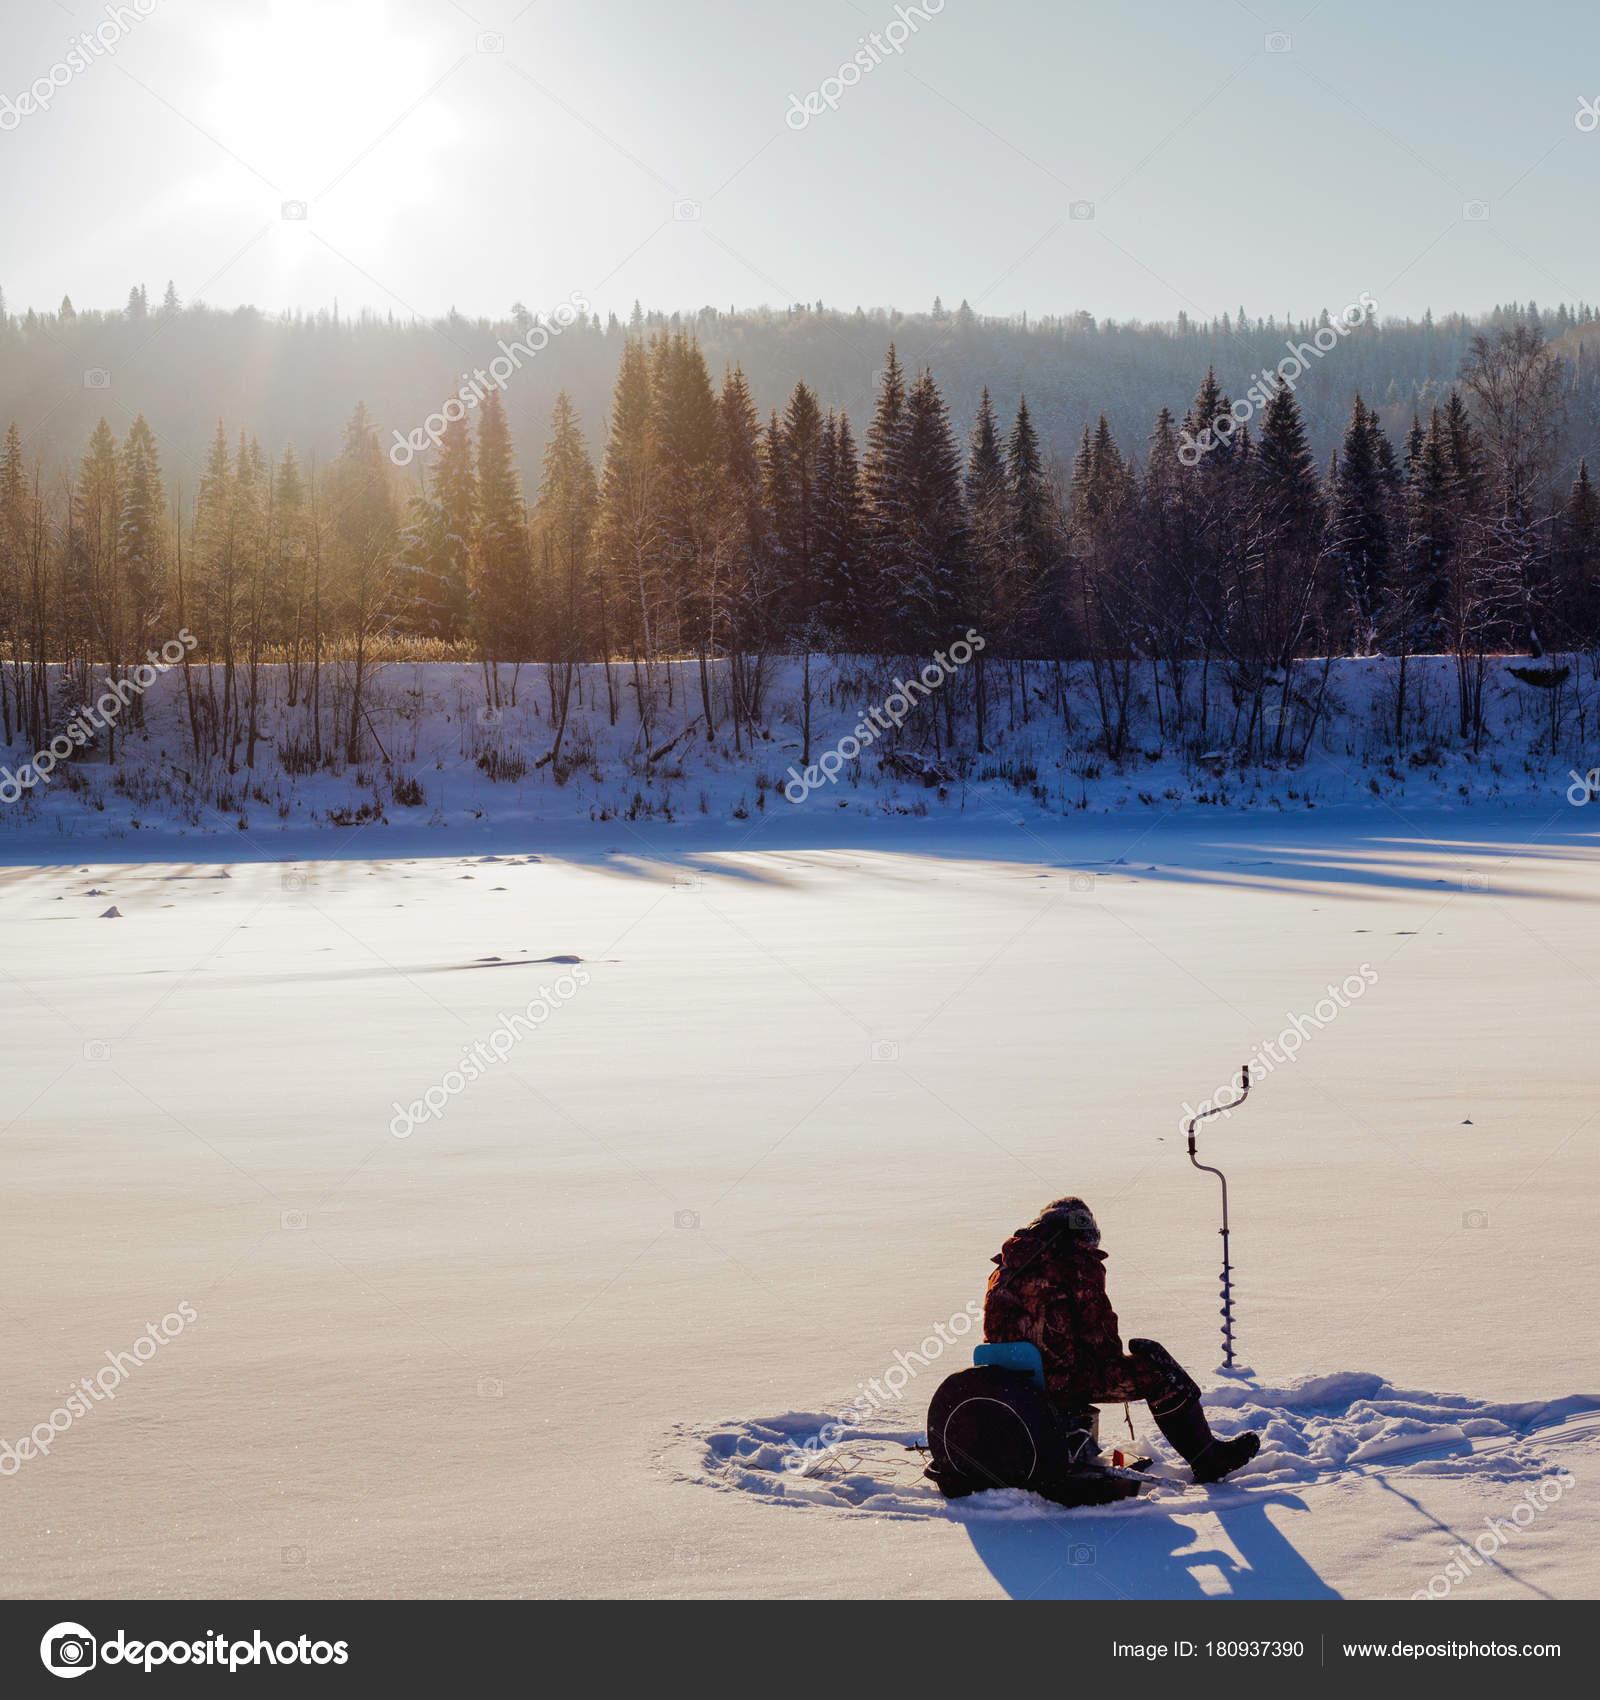 f1db5016b9 Χειμερινό Ψάρεμα Πάγου Ψαράς Ψάρεμα Χειμώνα Στον Ποταμό — Φωτογραφία Αρχείου